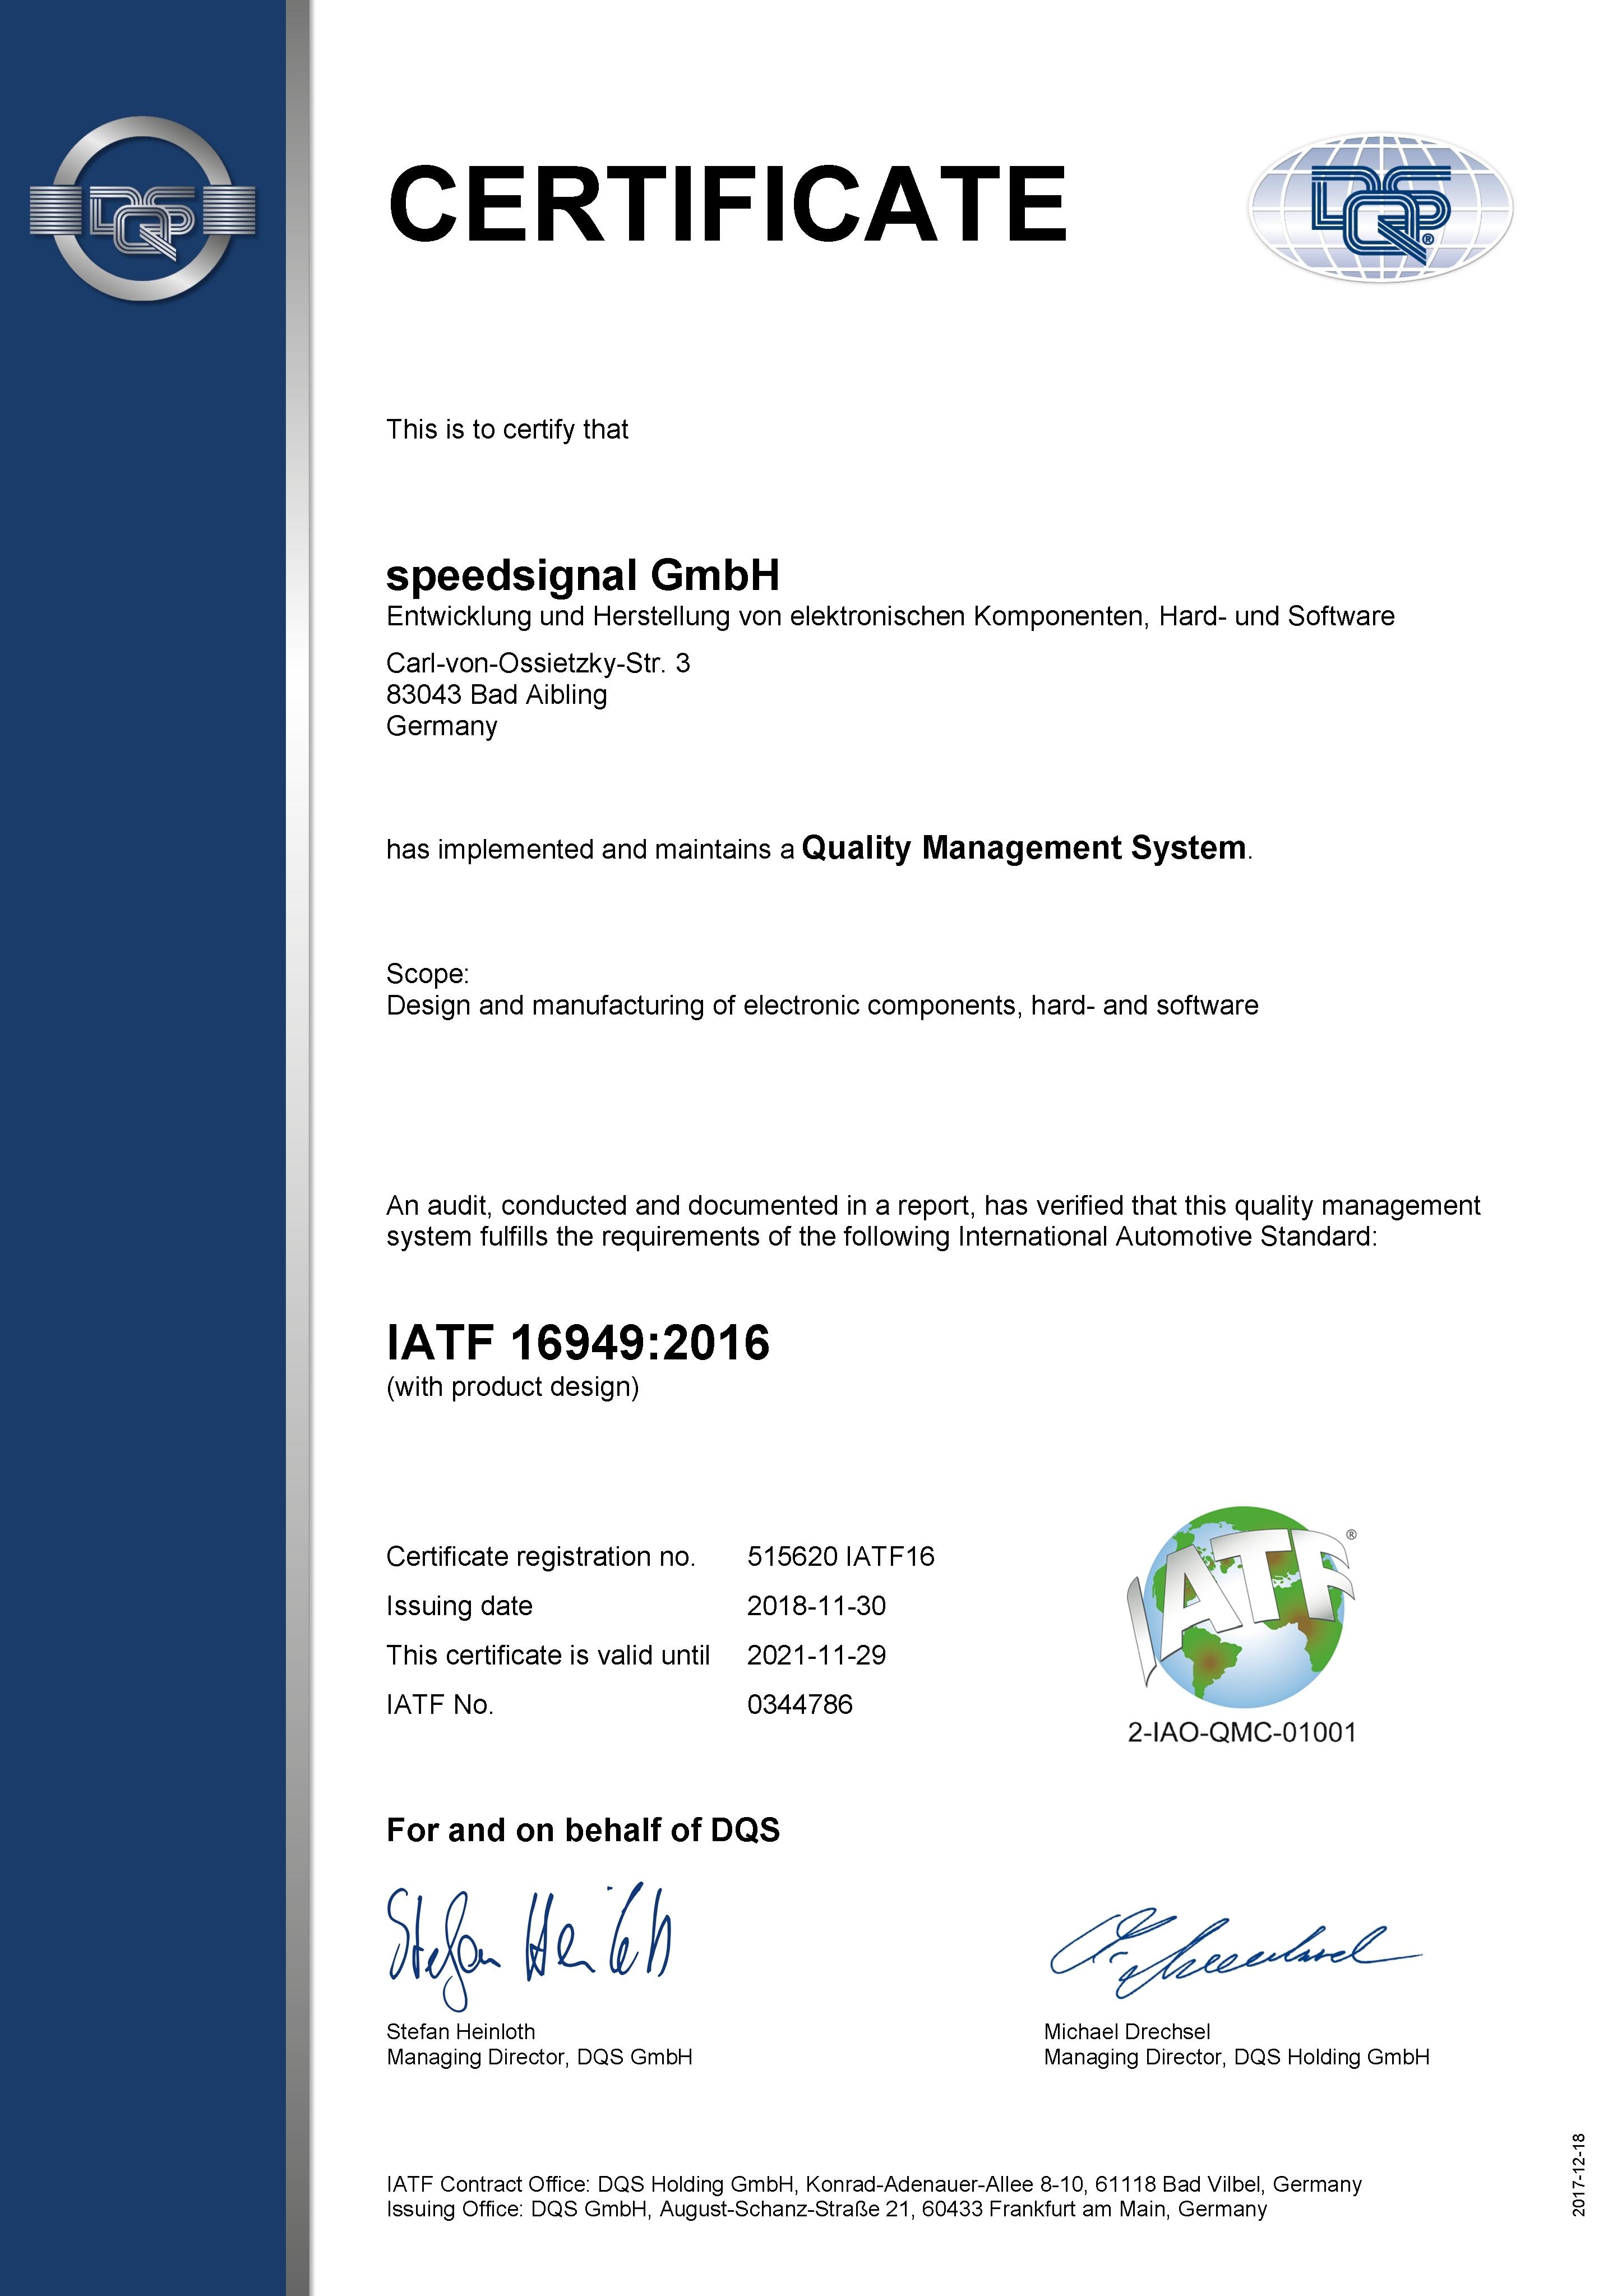 IATF16949 certificate